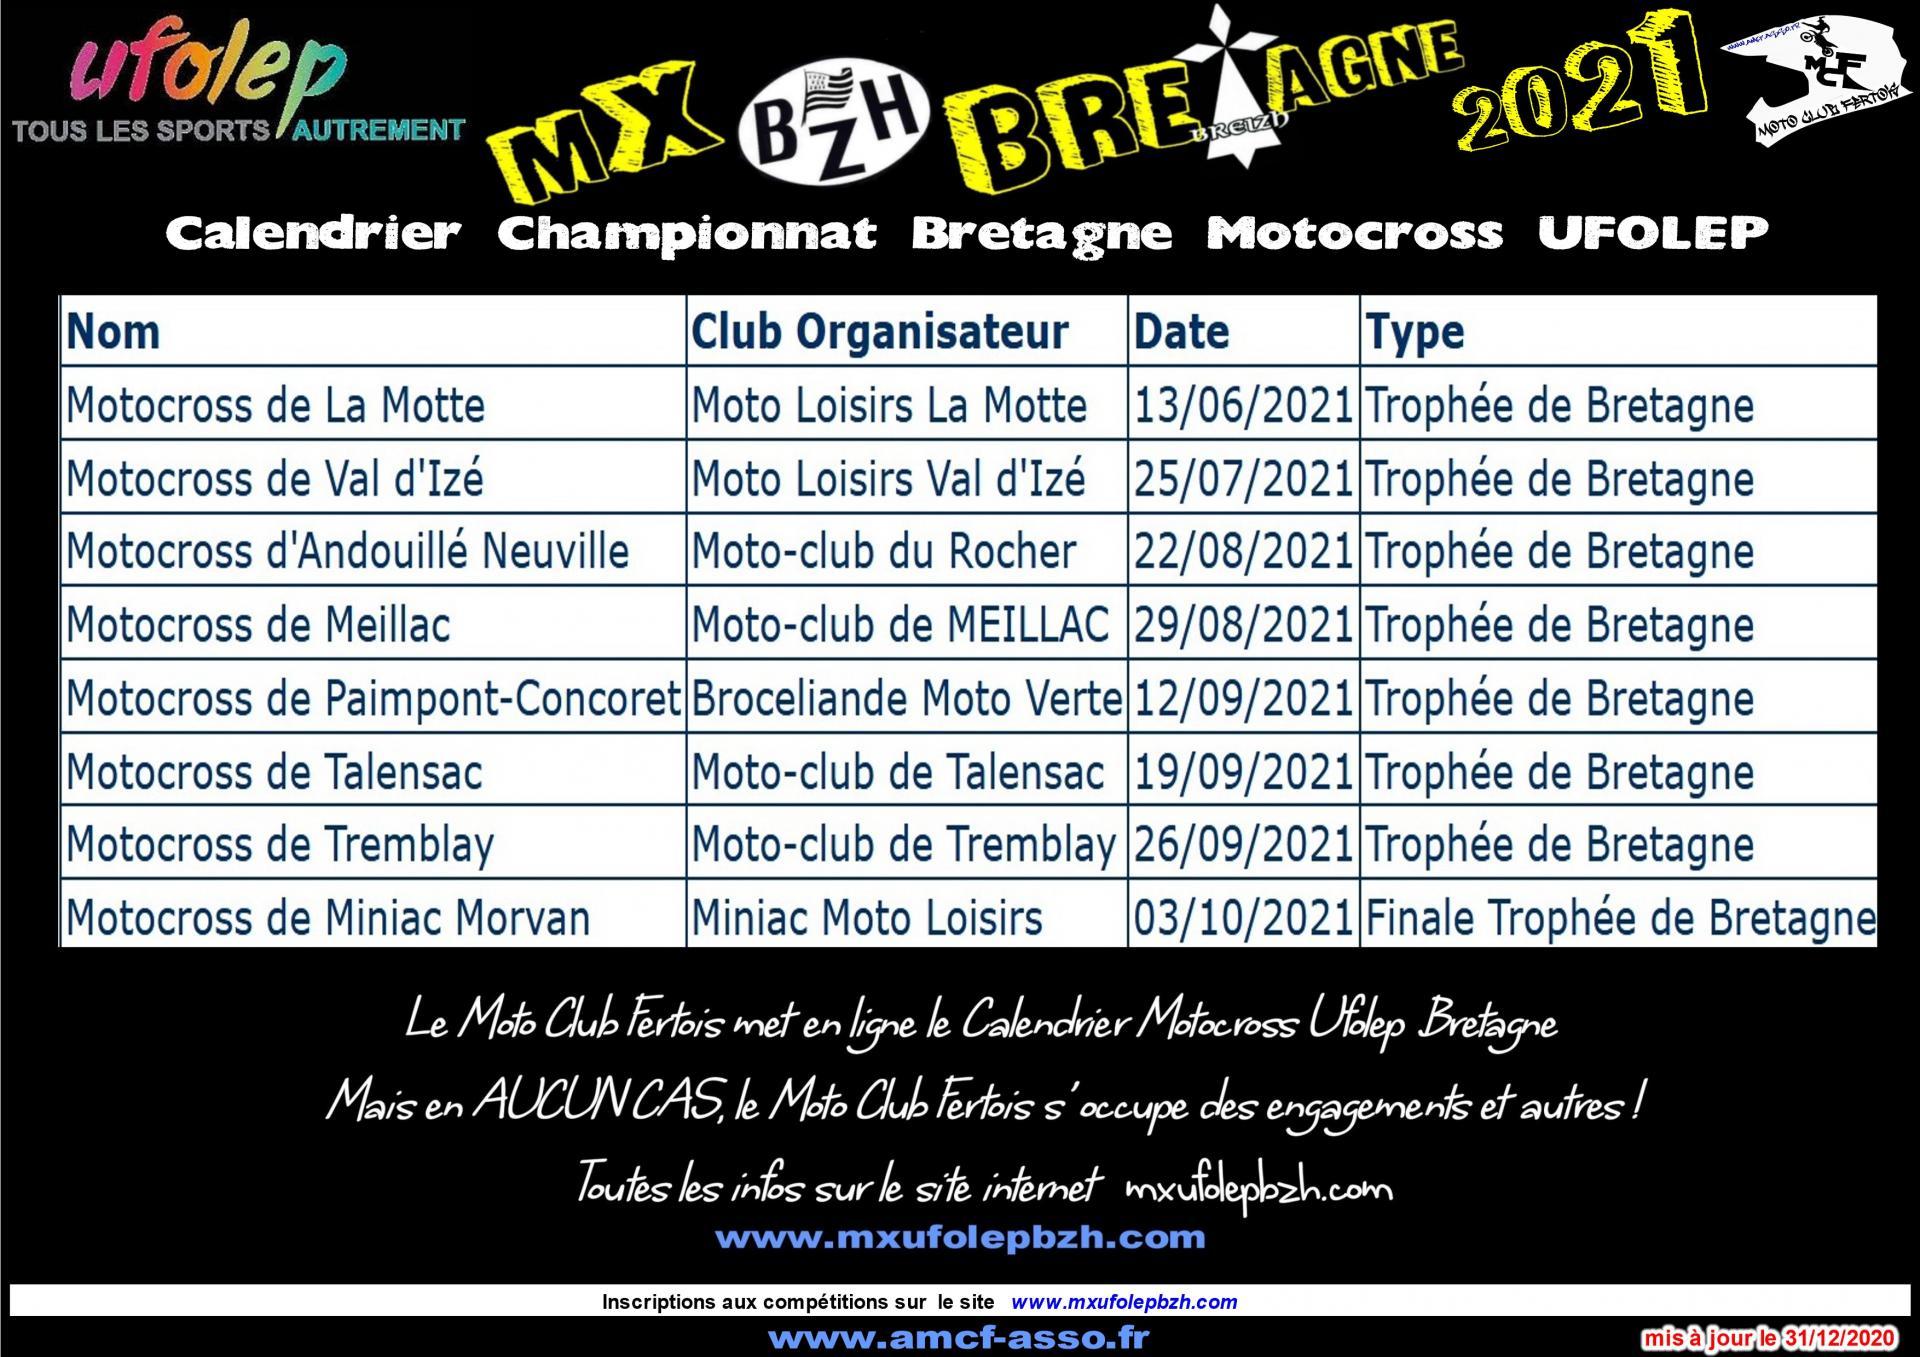 Calendrier UFOLEP Motocross Bretagne 2021